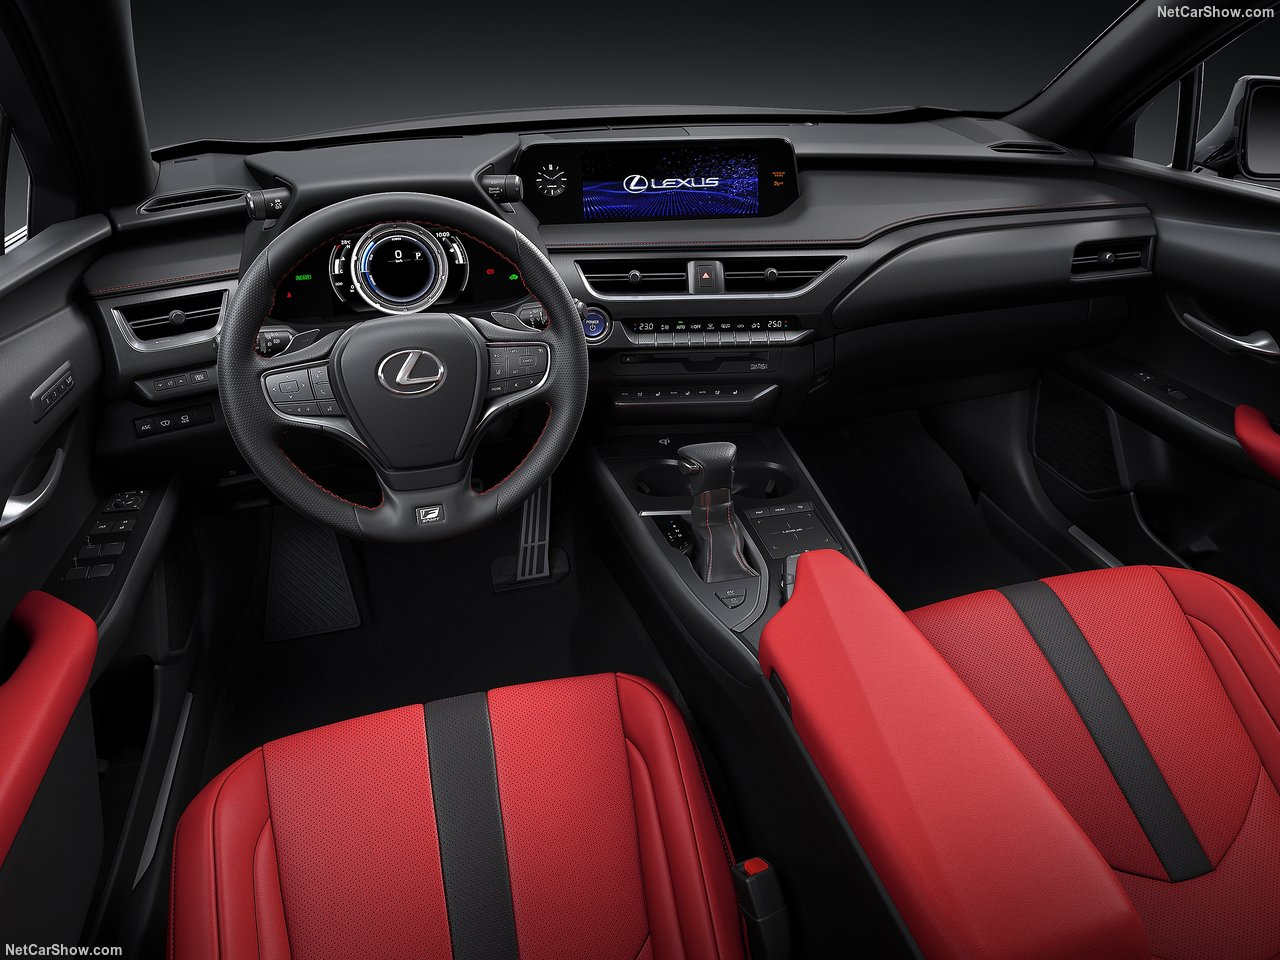 Lexus-UX-2019-1280-92.jpg